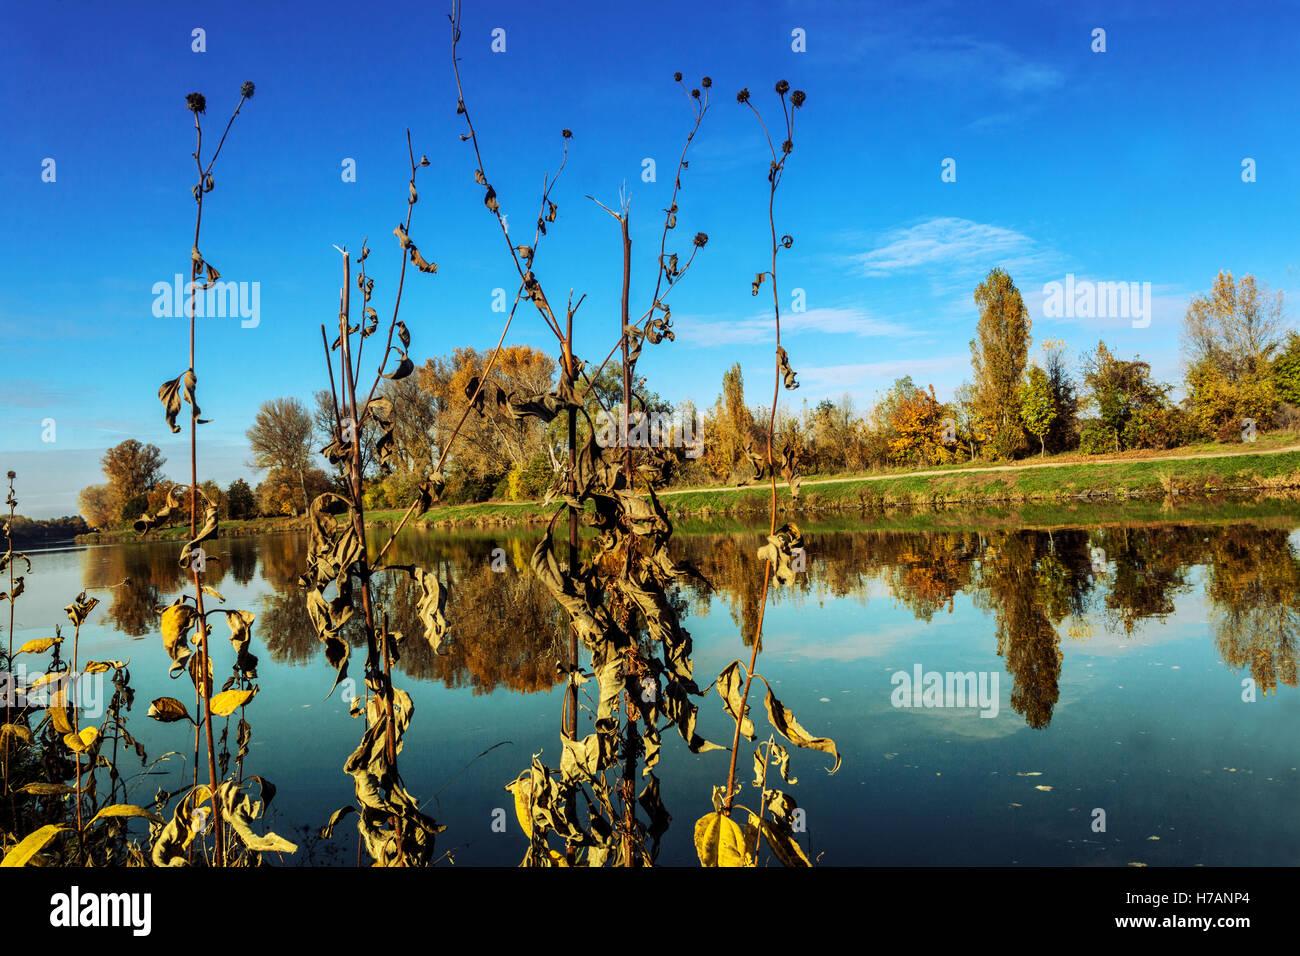 Autumn colors along the Elbe River, Central Bohemia, Czech Republic - Stock Image